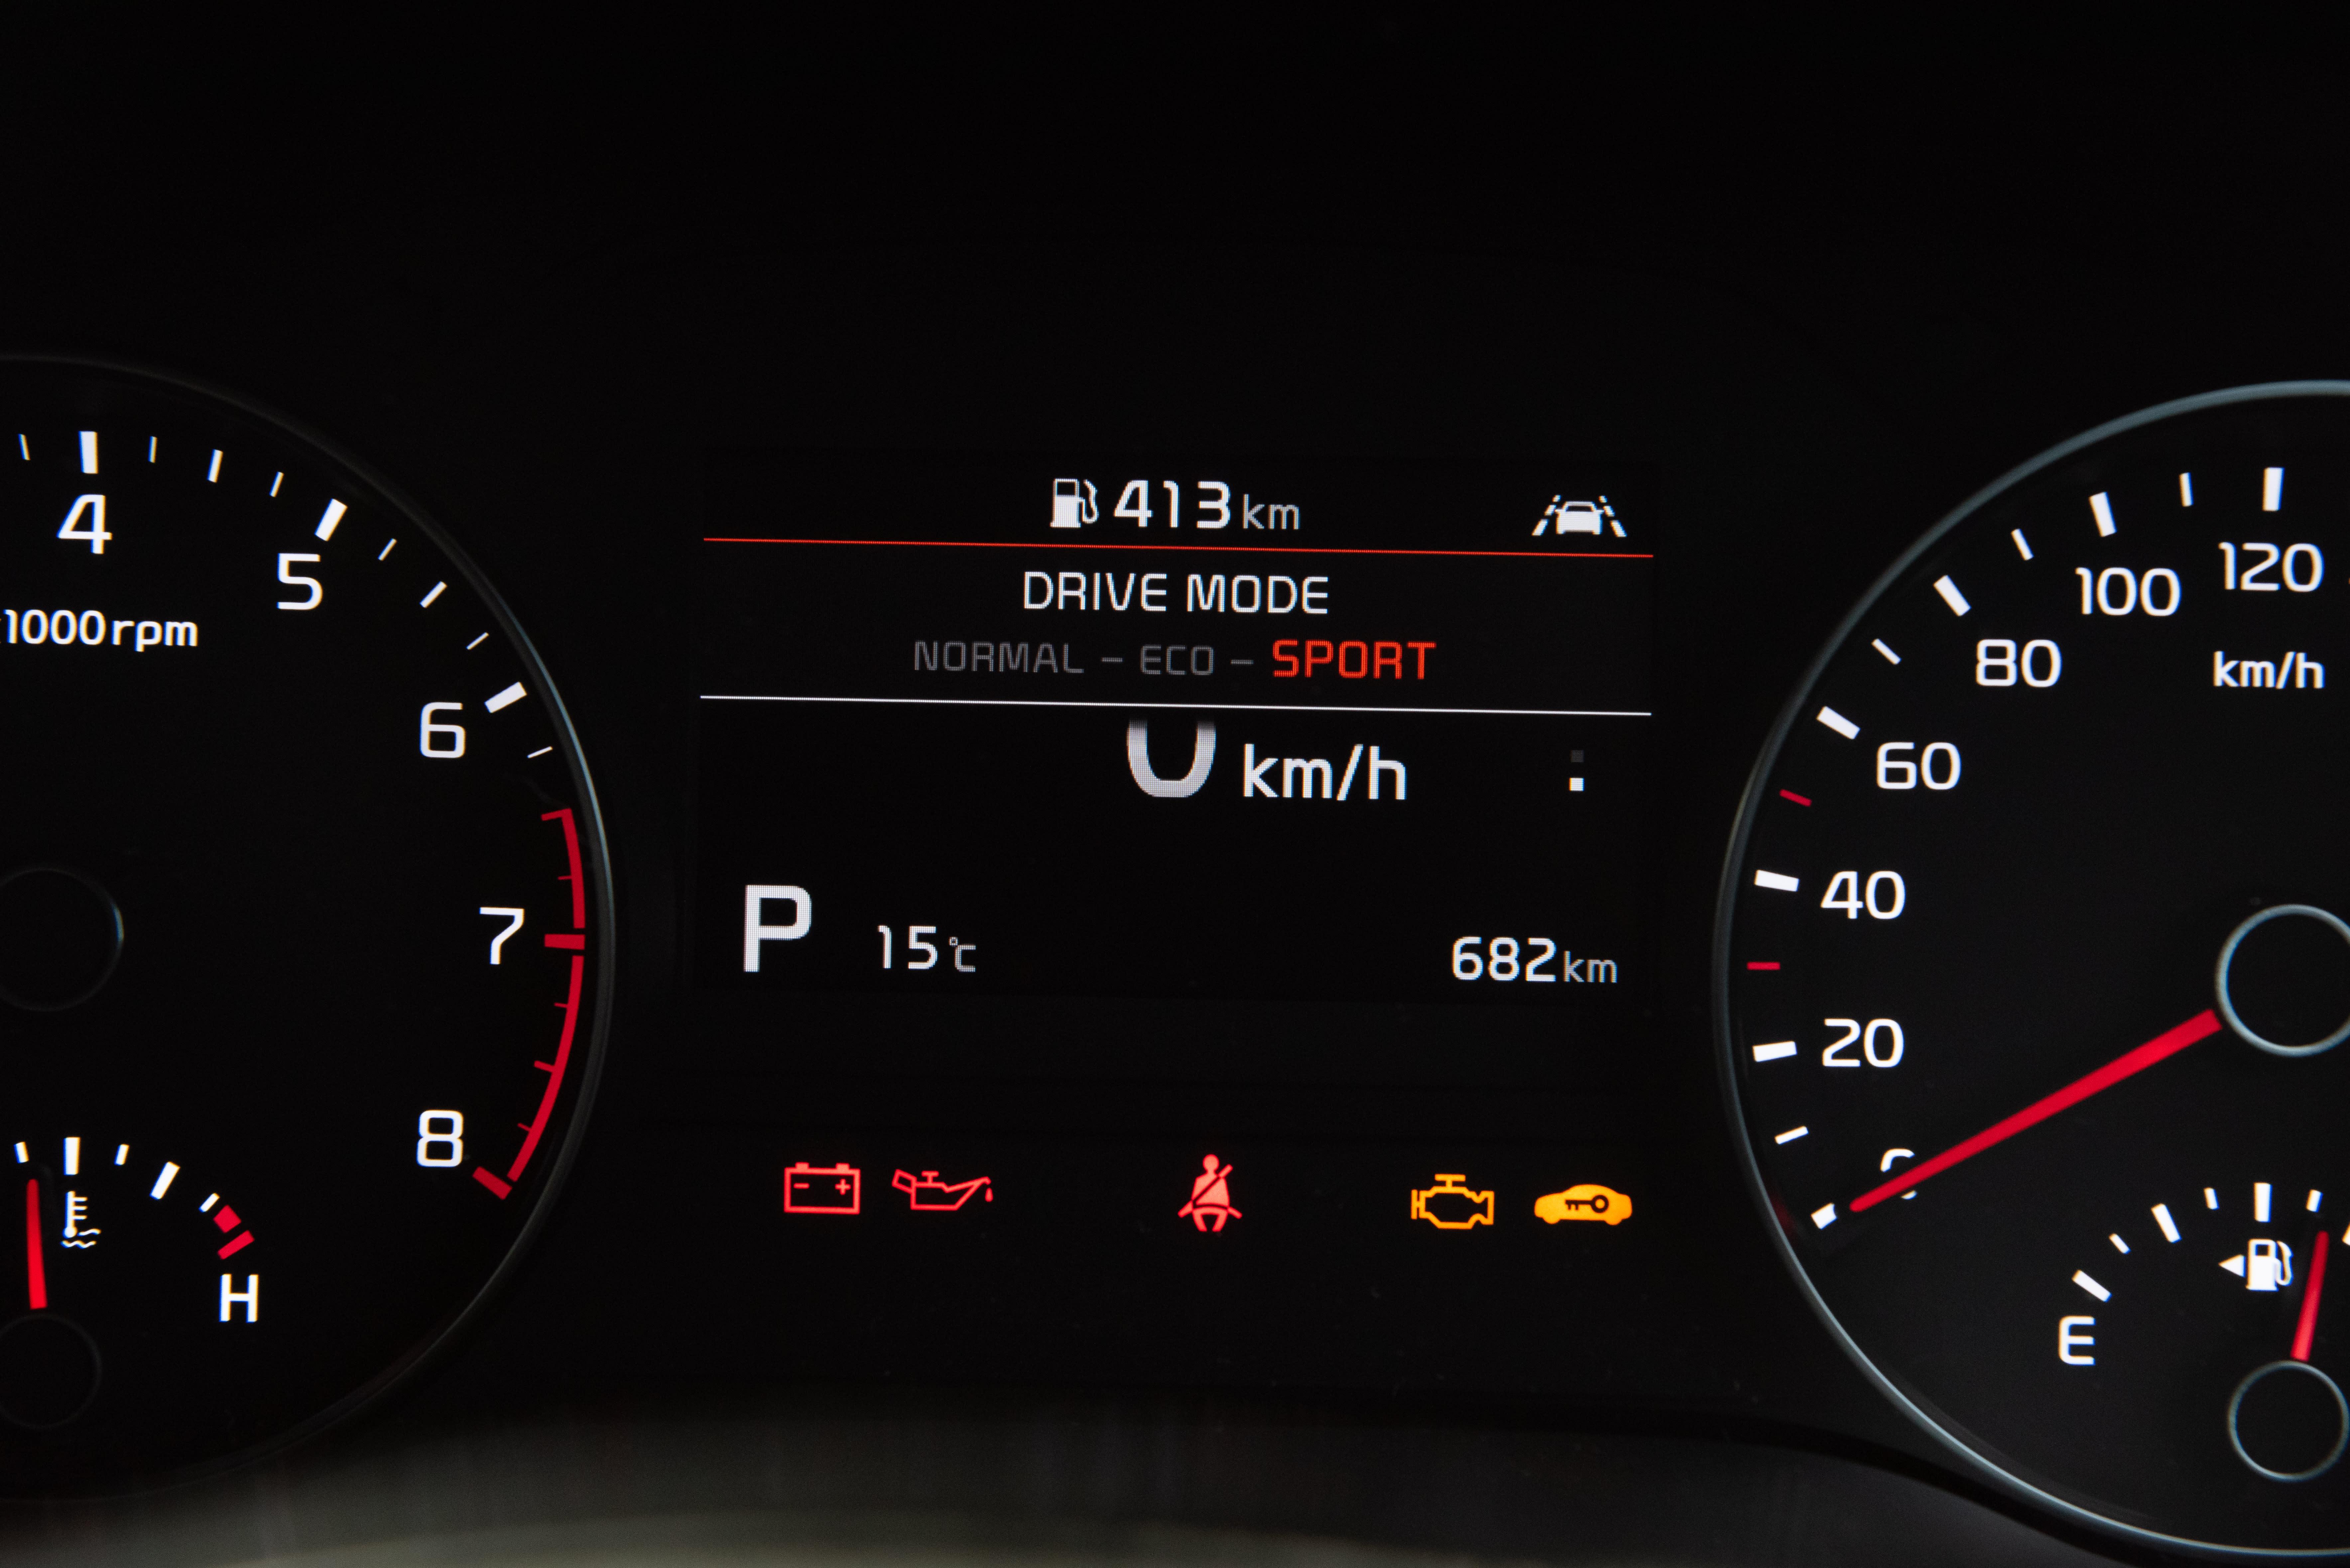 2019 Kia Sportage GT-Line petrol review | CarAdvice